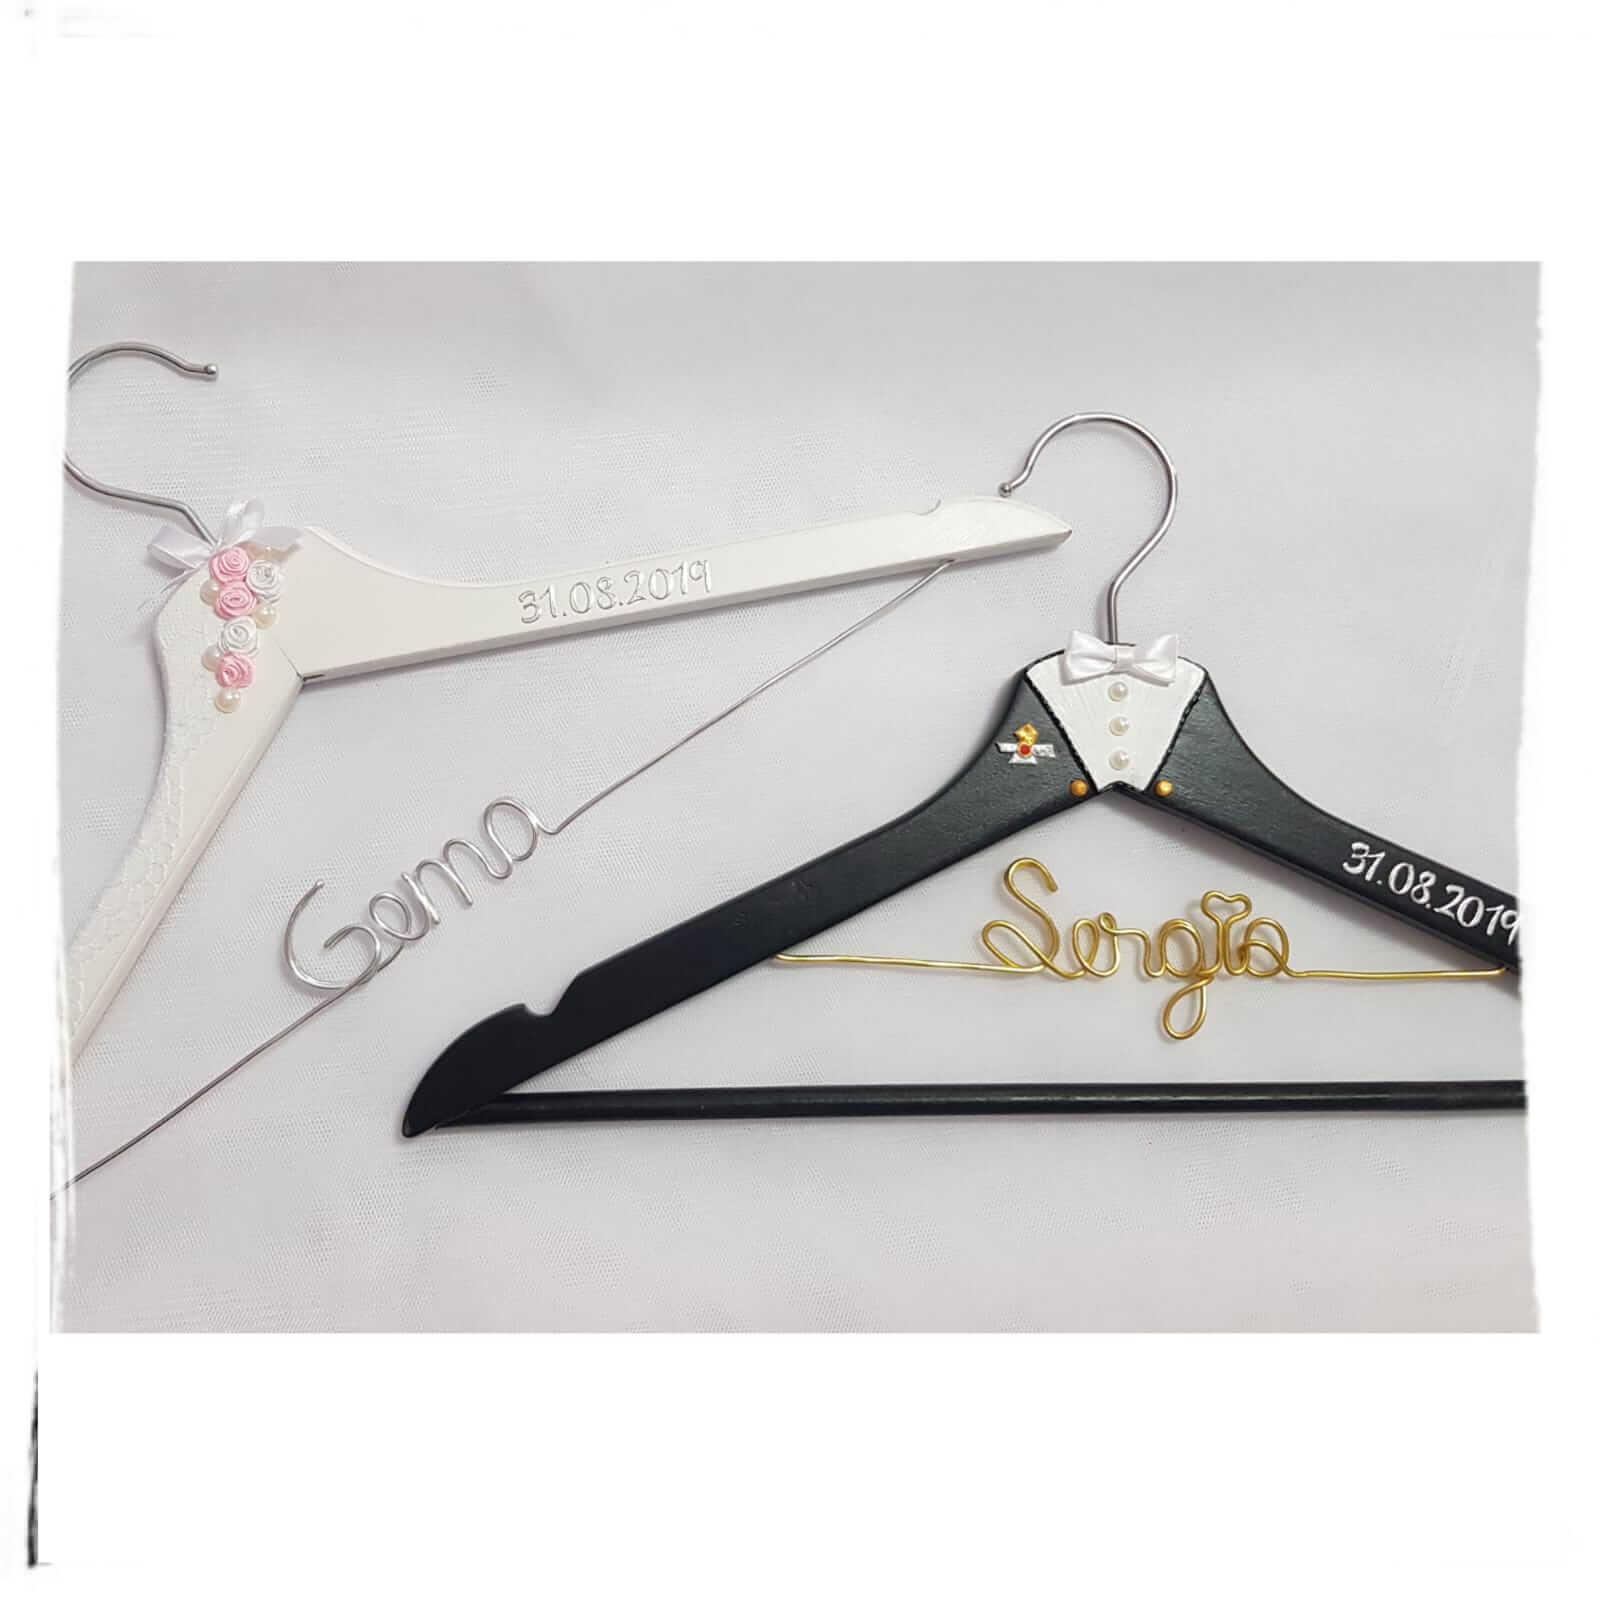 perchas personalizadas perchas personalizadas - perchas personalizadas perchas novios detalles boda 3 - perchas personalizadas | perchas novios | perchas personalizadas boda